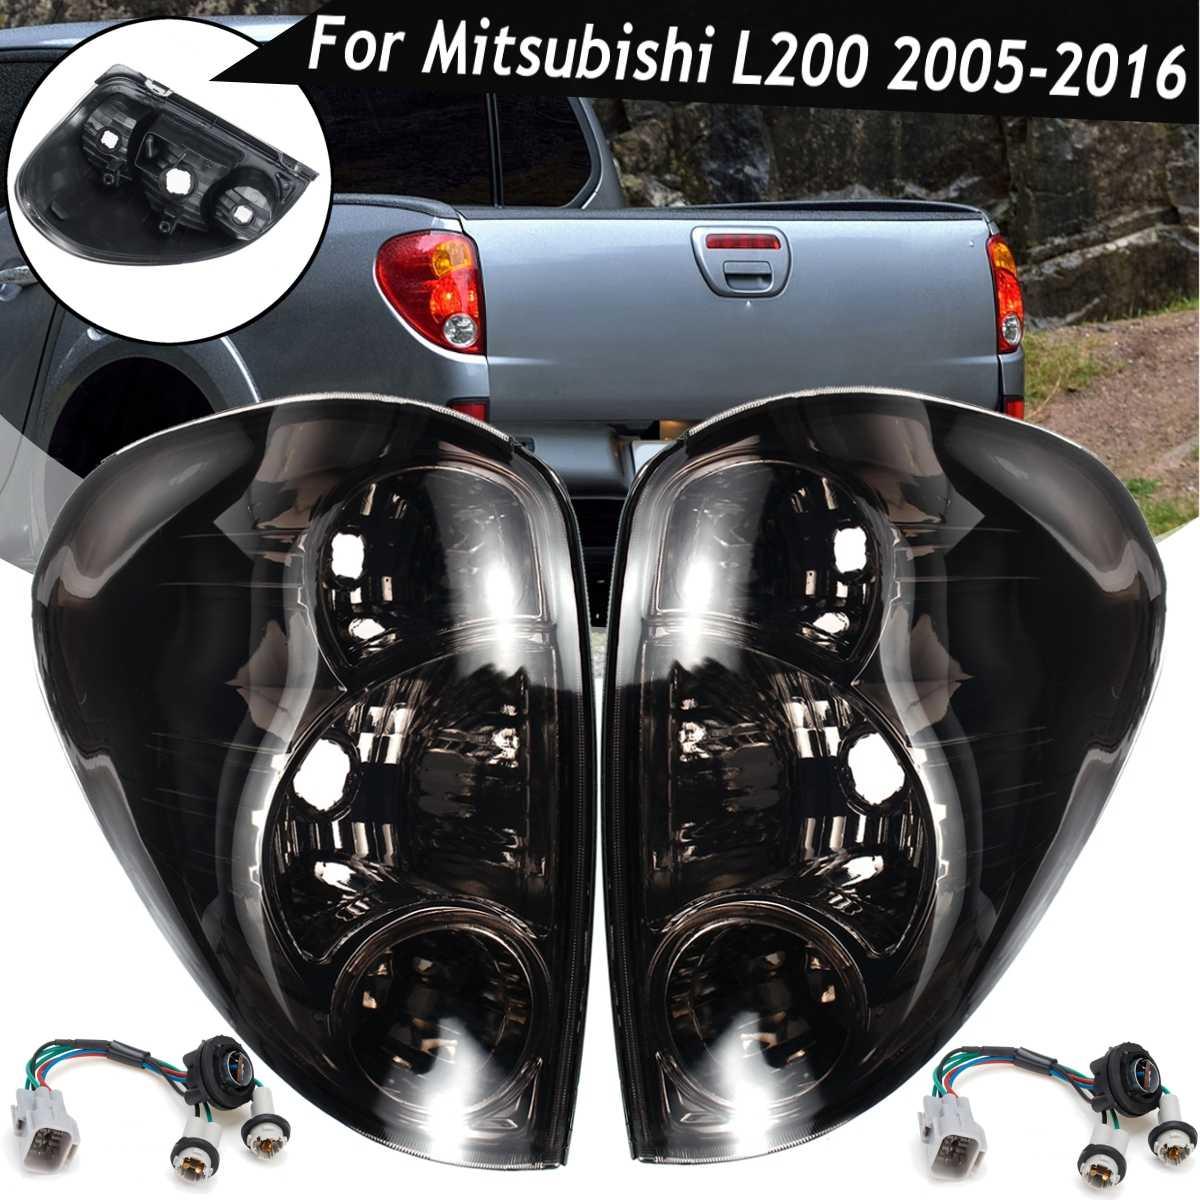 Smoke Taillight For Mitsubishi L200 Triton Colt Pickup 2005-2015 Tail Light Side Rear Brake Reverse Stop Lamp Car  Accessories